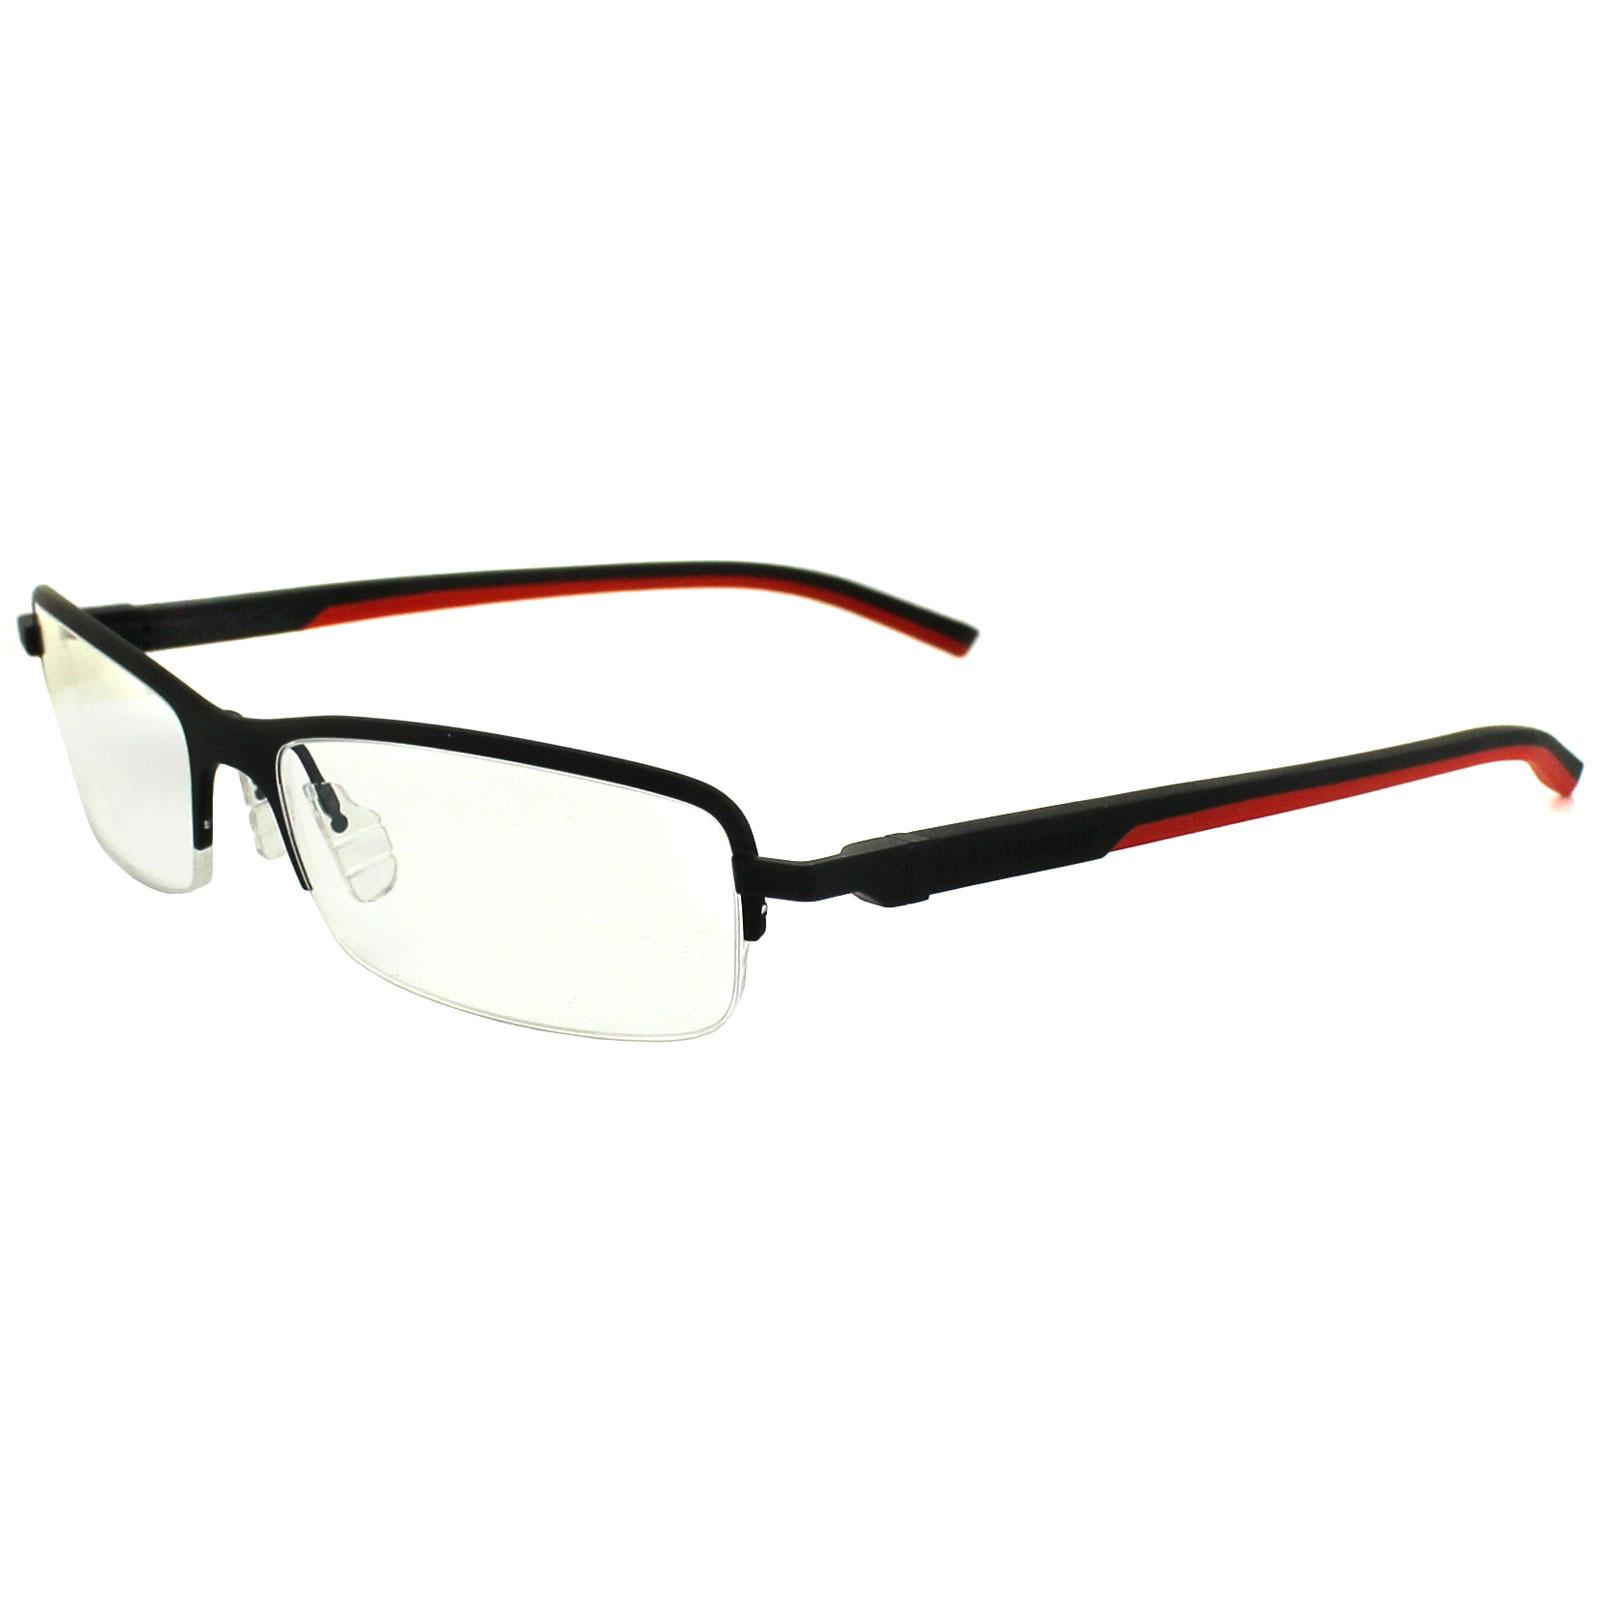 Tag heuer glasses frames automatic 0824 012 matt black red